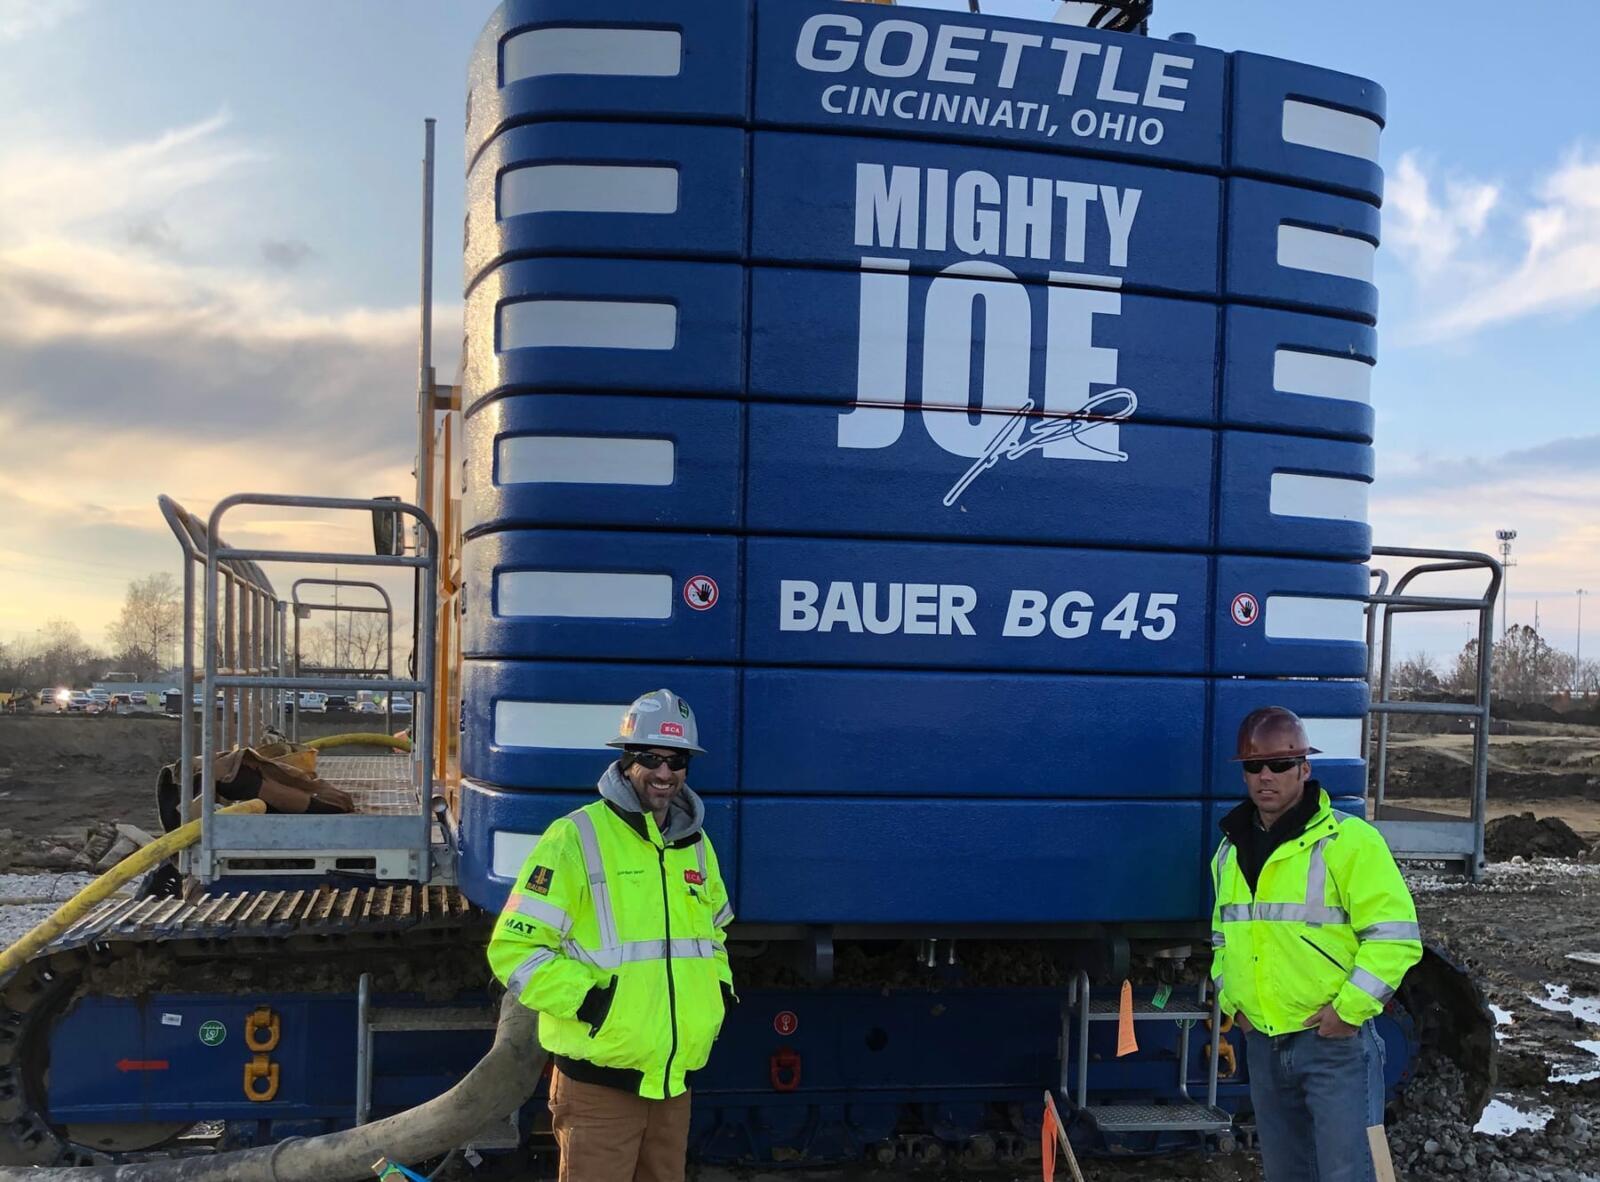 Mighty joe bauer bg 45 dedication